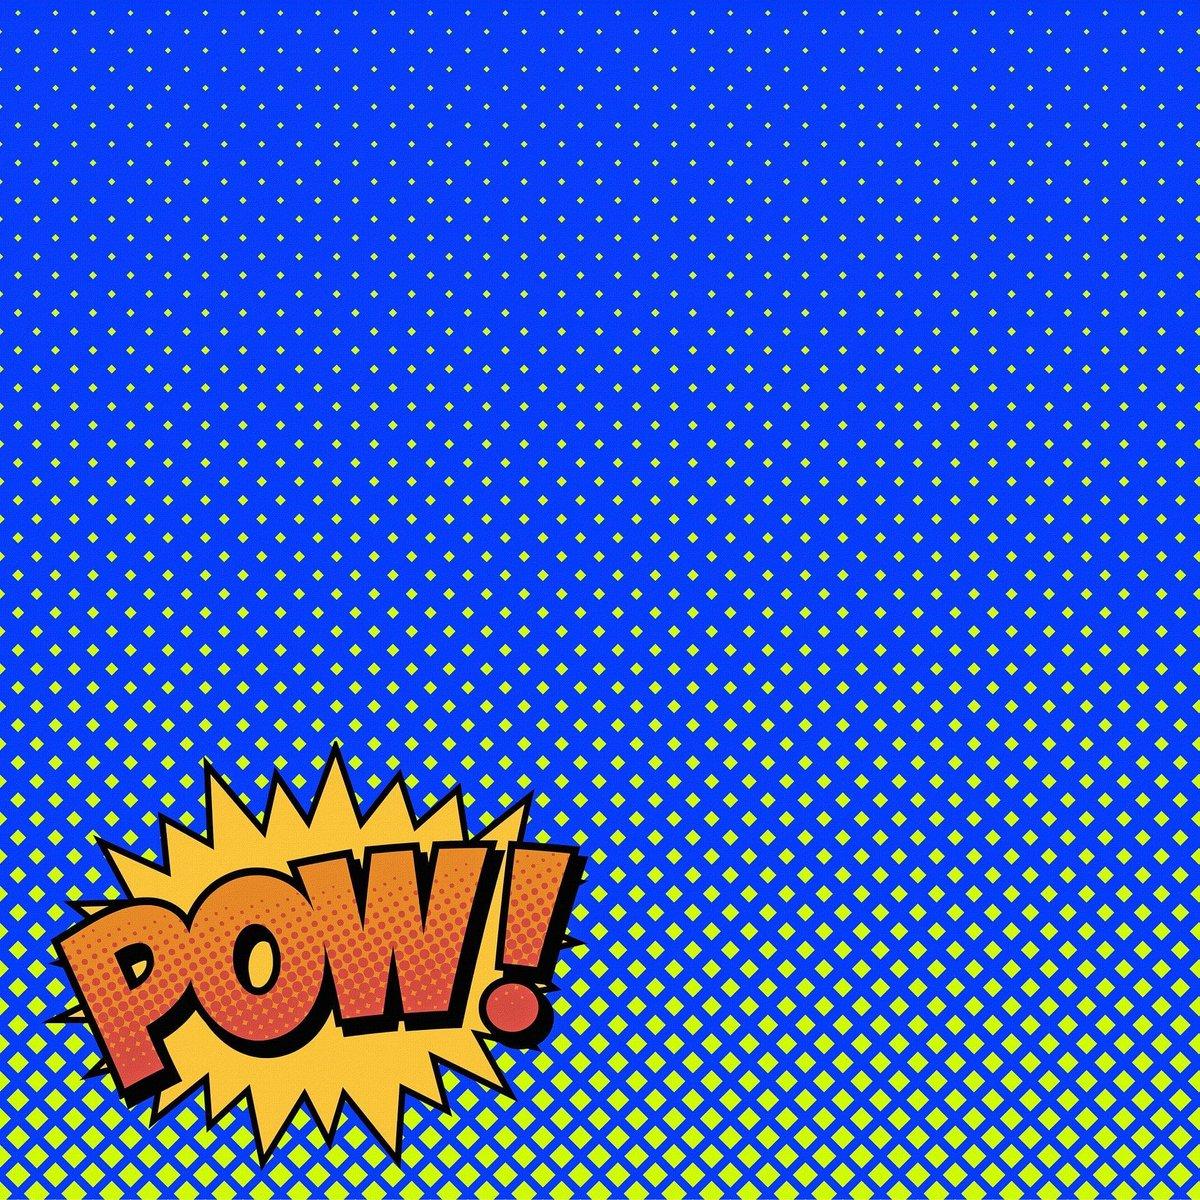 How http://PressHero.co ... |    https://presshero.co/how-presshero-co-saved-a-business-from-a-6000-disaster/…   #digitalmarketing #LdnOnt #webdesign #wordpress #pressheroco #wordpresssupportpic.twitter.com/G4mcfAYptv